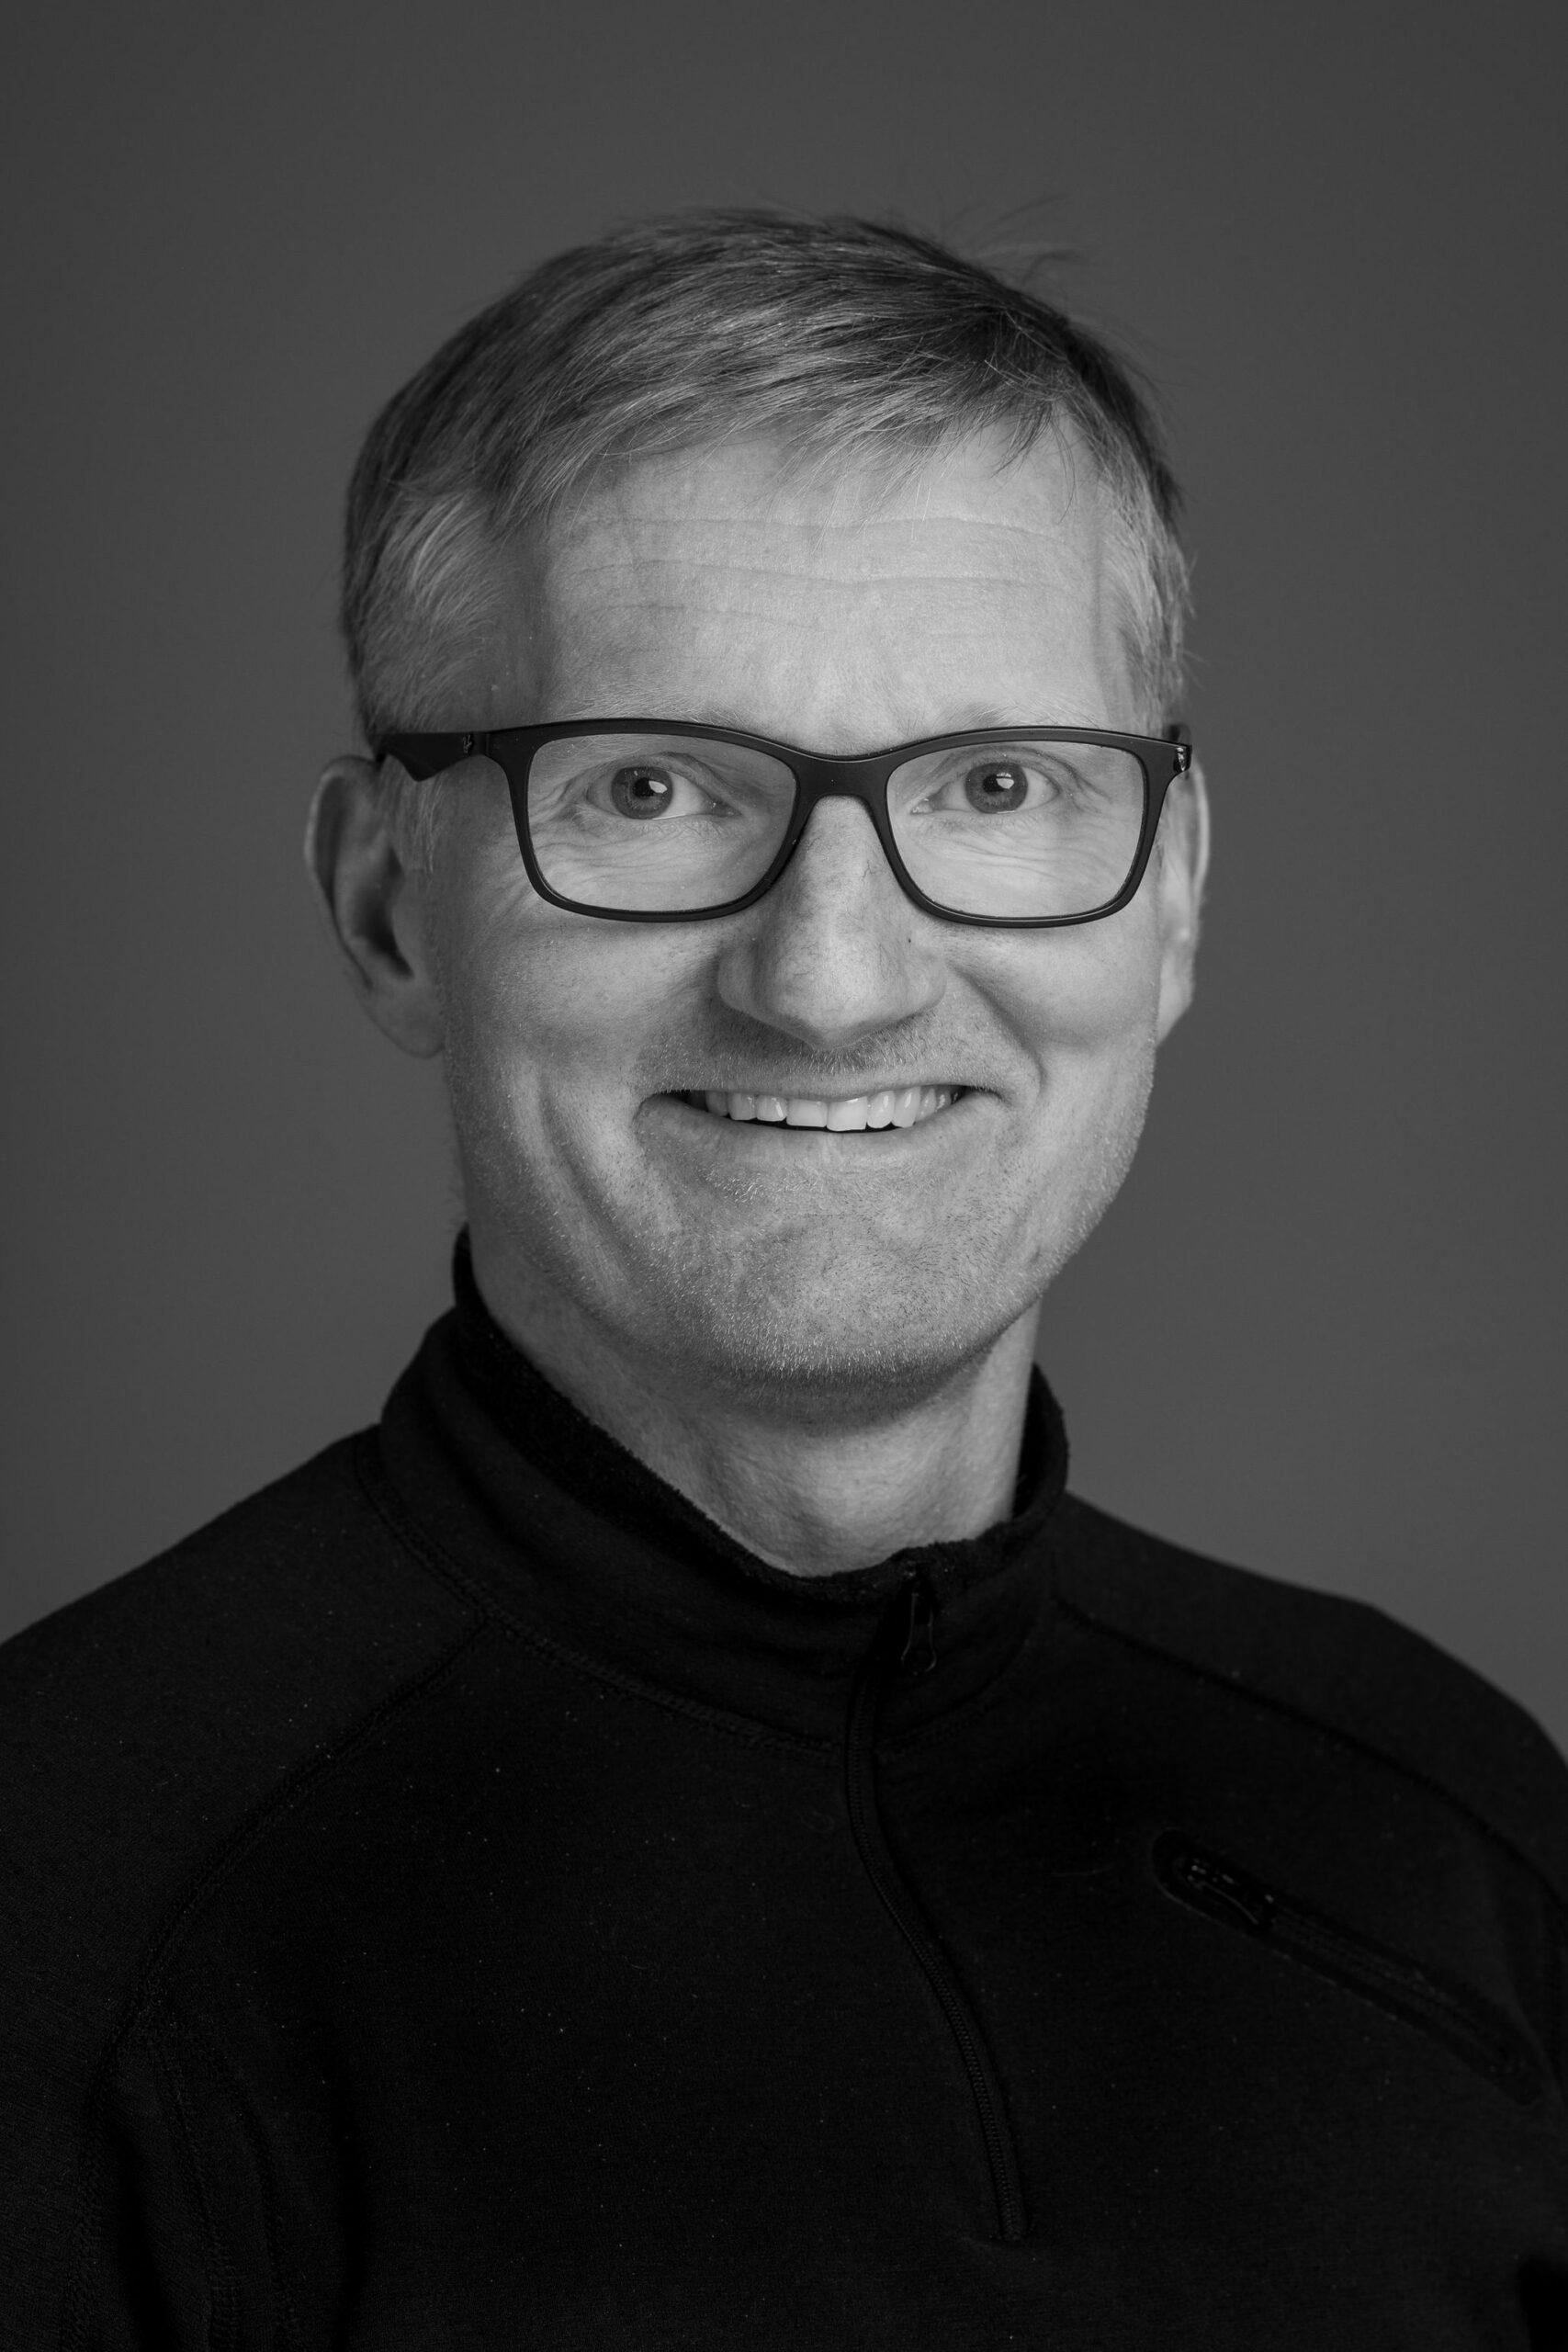 Kristinn H. Guðbrandsson